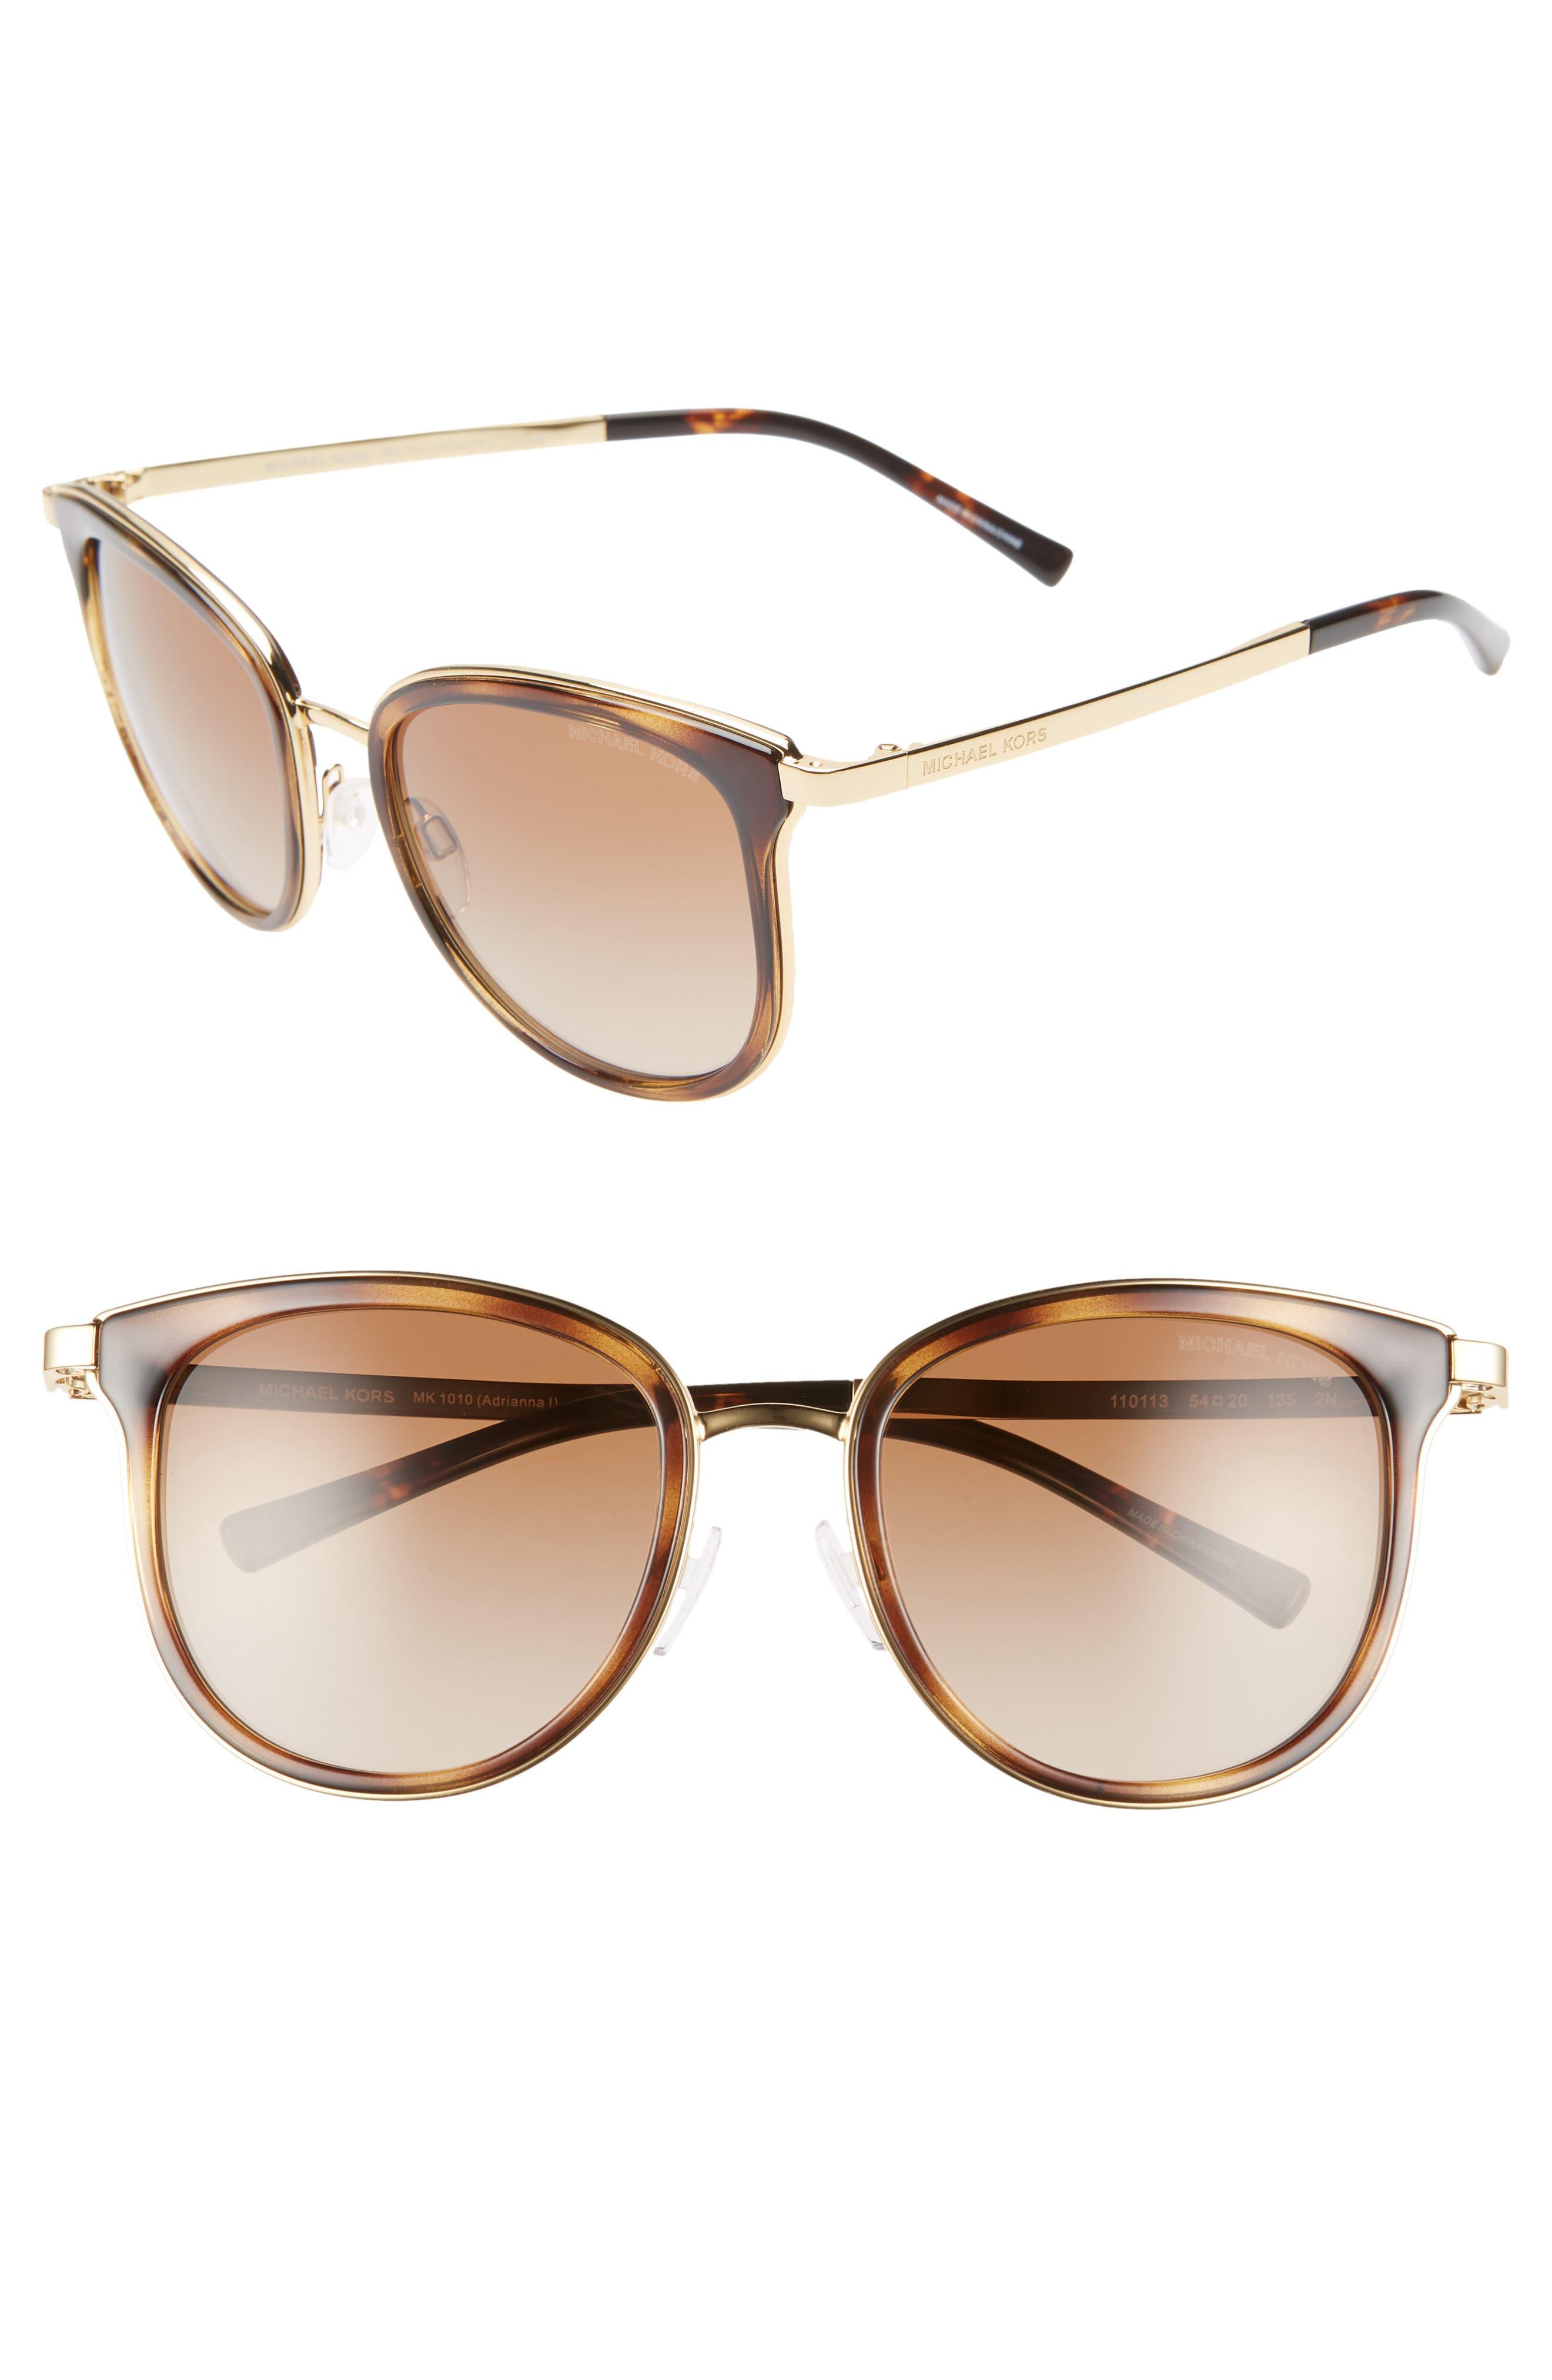 54mm Round Sunglasses, Main, color, 200